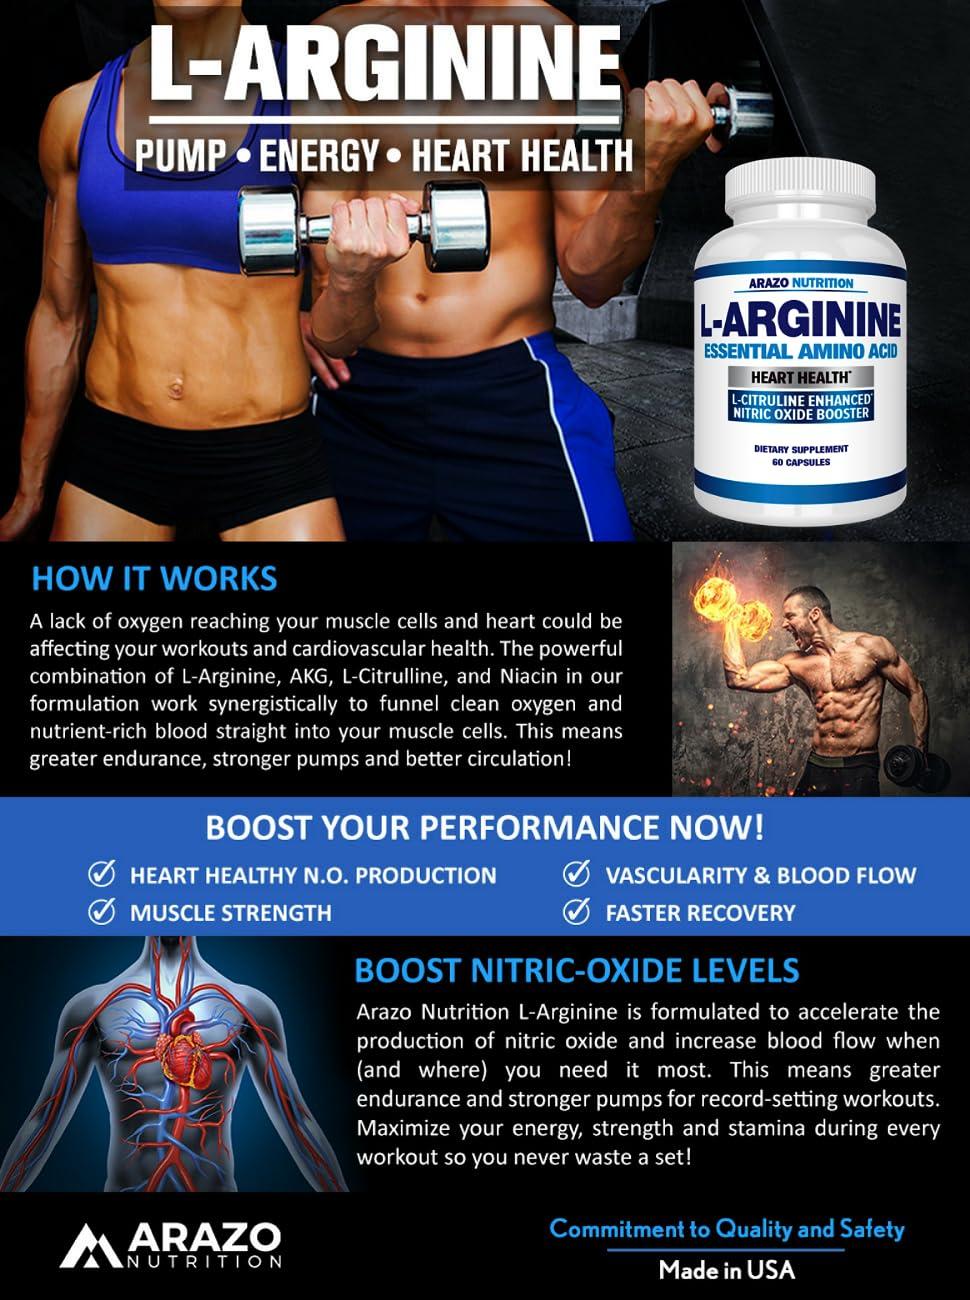 Premium L Arginine - 1340mg Nitric Oxide Booster with L-Citrulline &  Essential Amino Acids for Heart